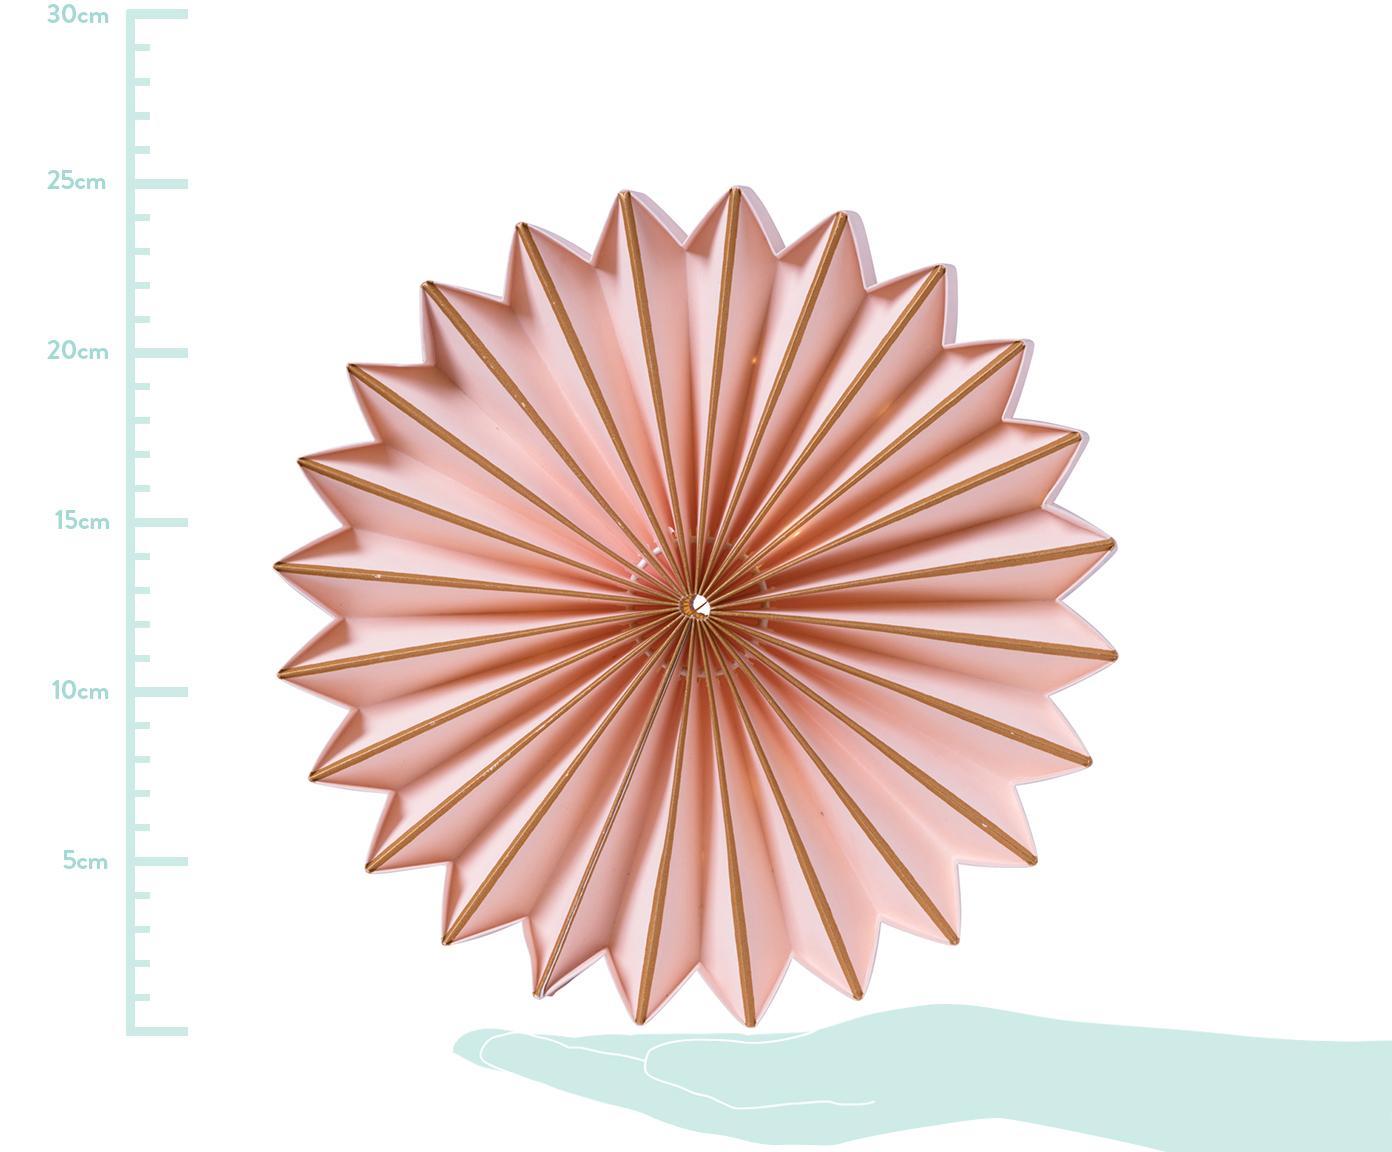 LED lichtobject Juliette, Papier, Roze, goudkleurig, Ø 25 cm